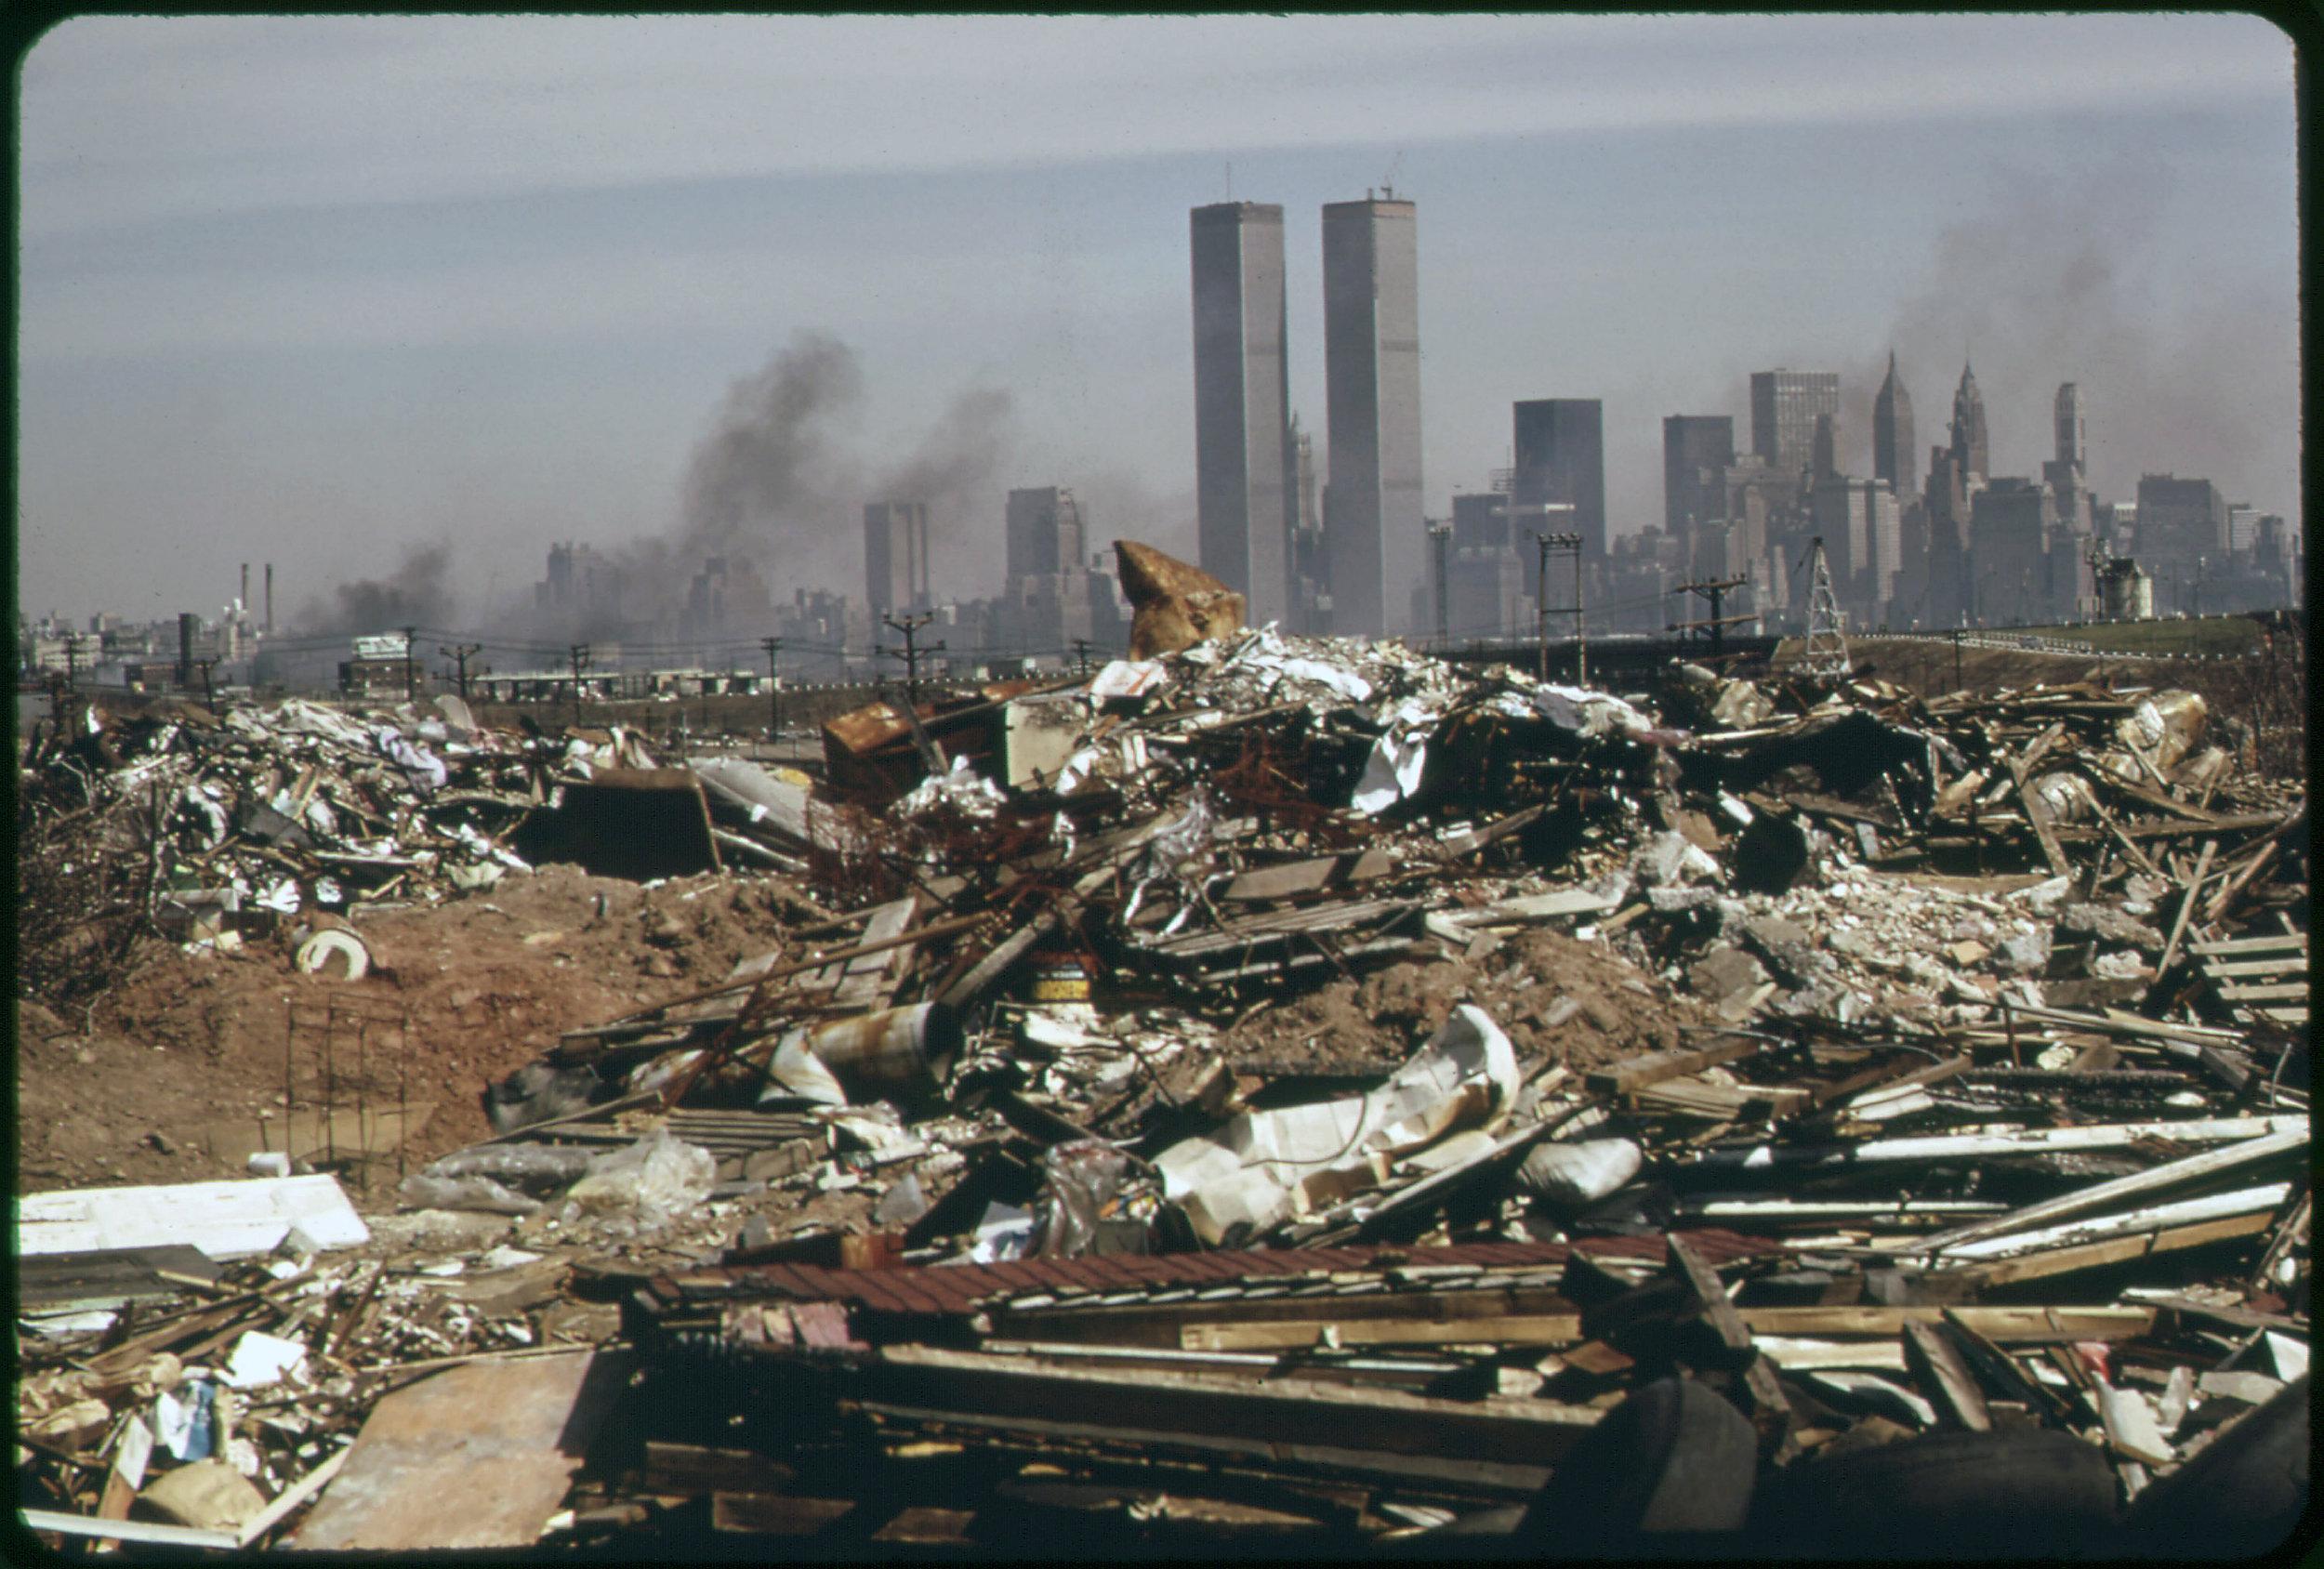 WTC_from_NJT-illegal_dump-hr.jpg